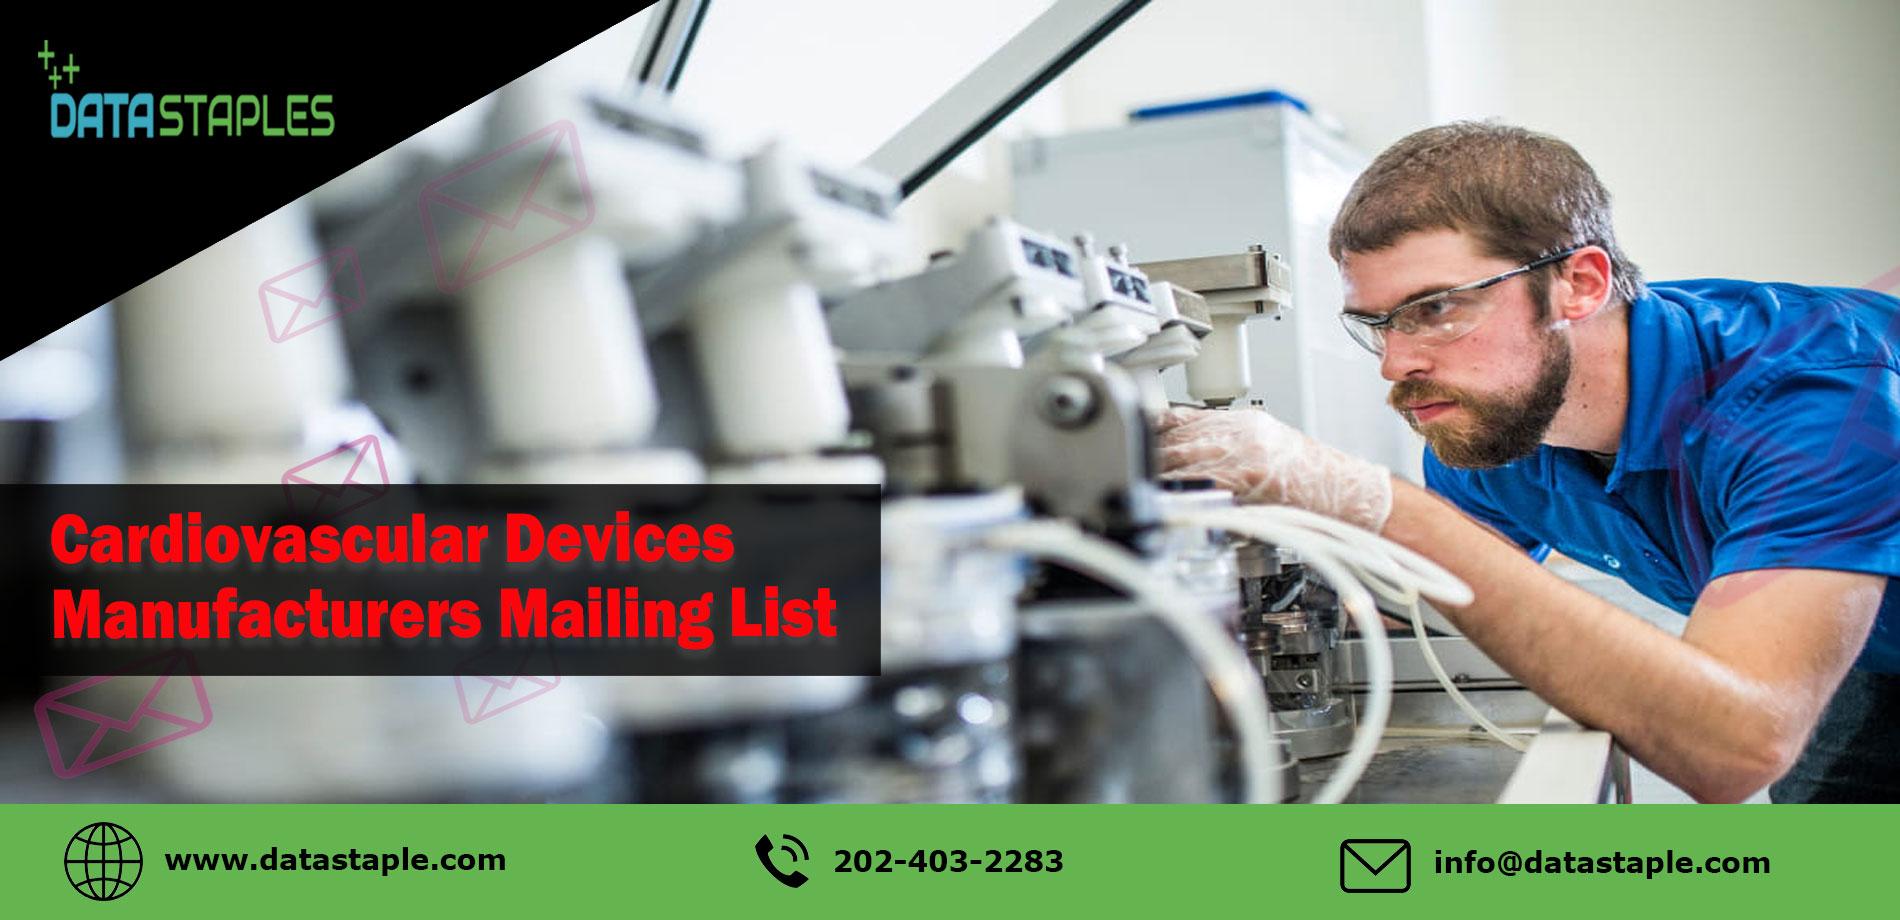 Cardiovascular Device Manufacturers Mailing List | DataStaples